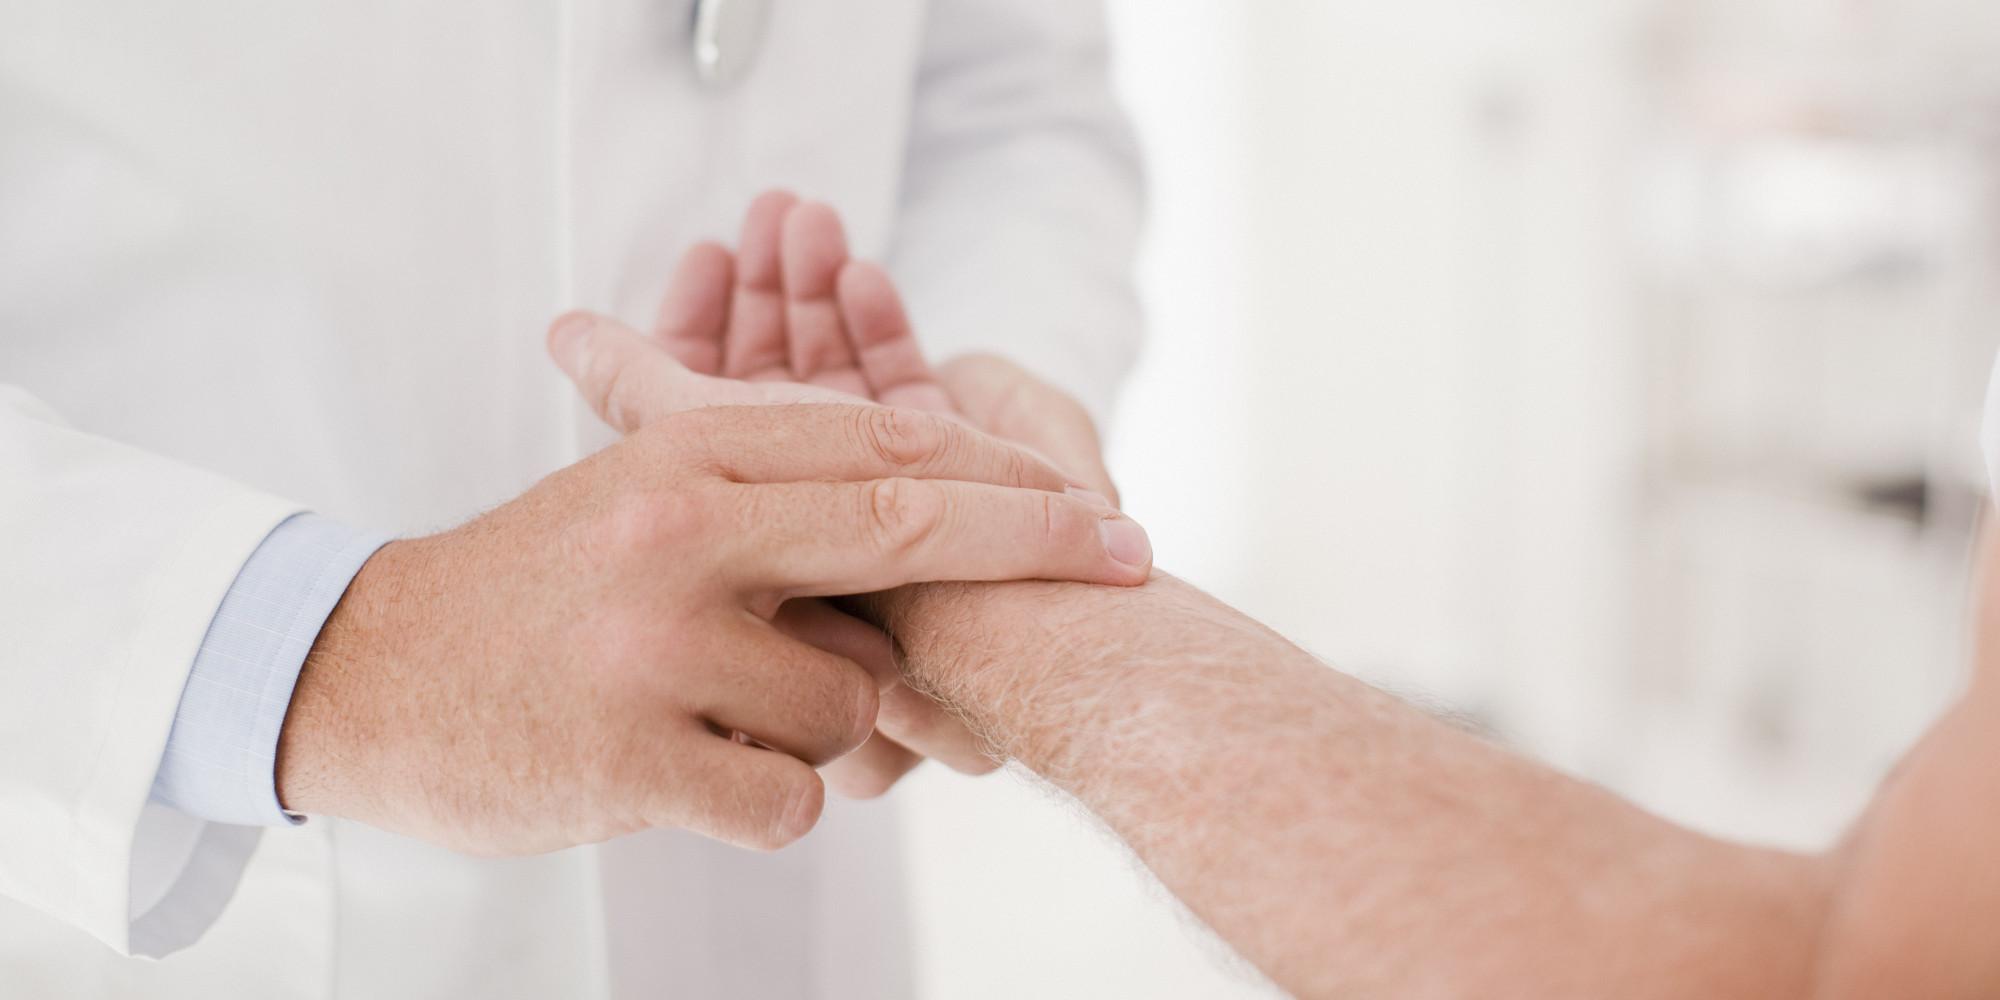 Senior Health Care Images Seniors With Health Care